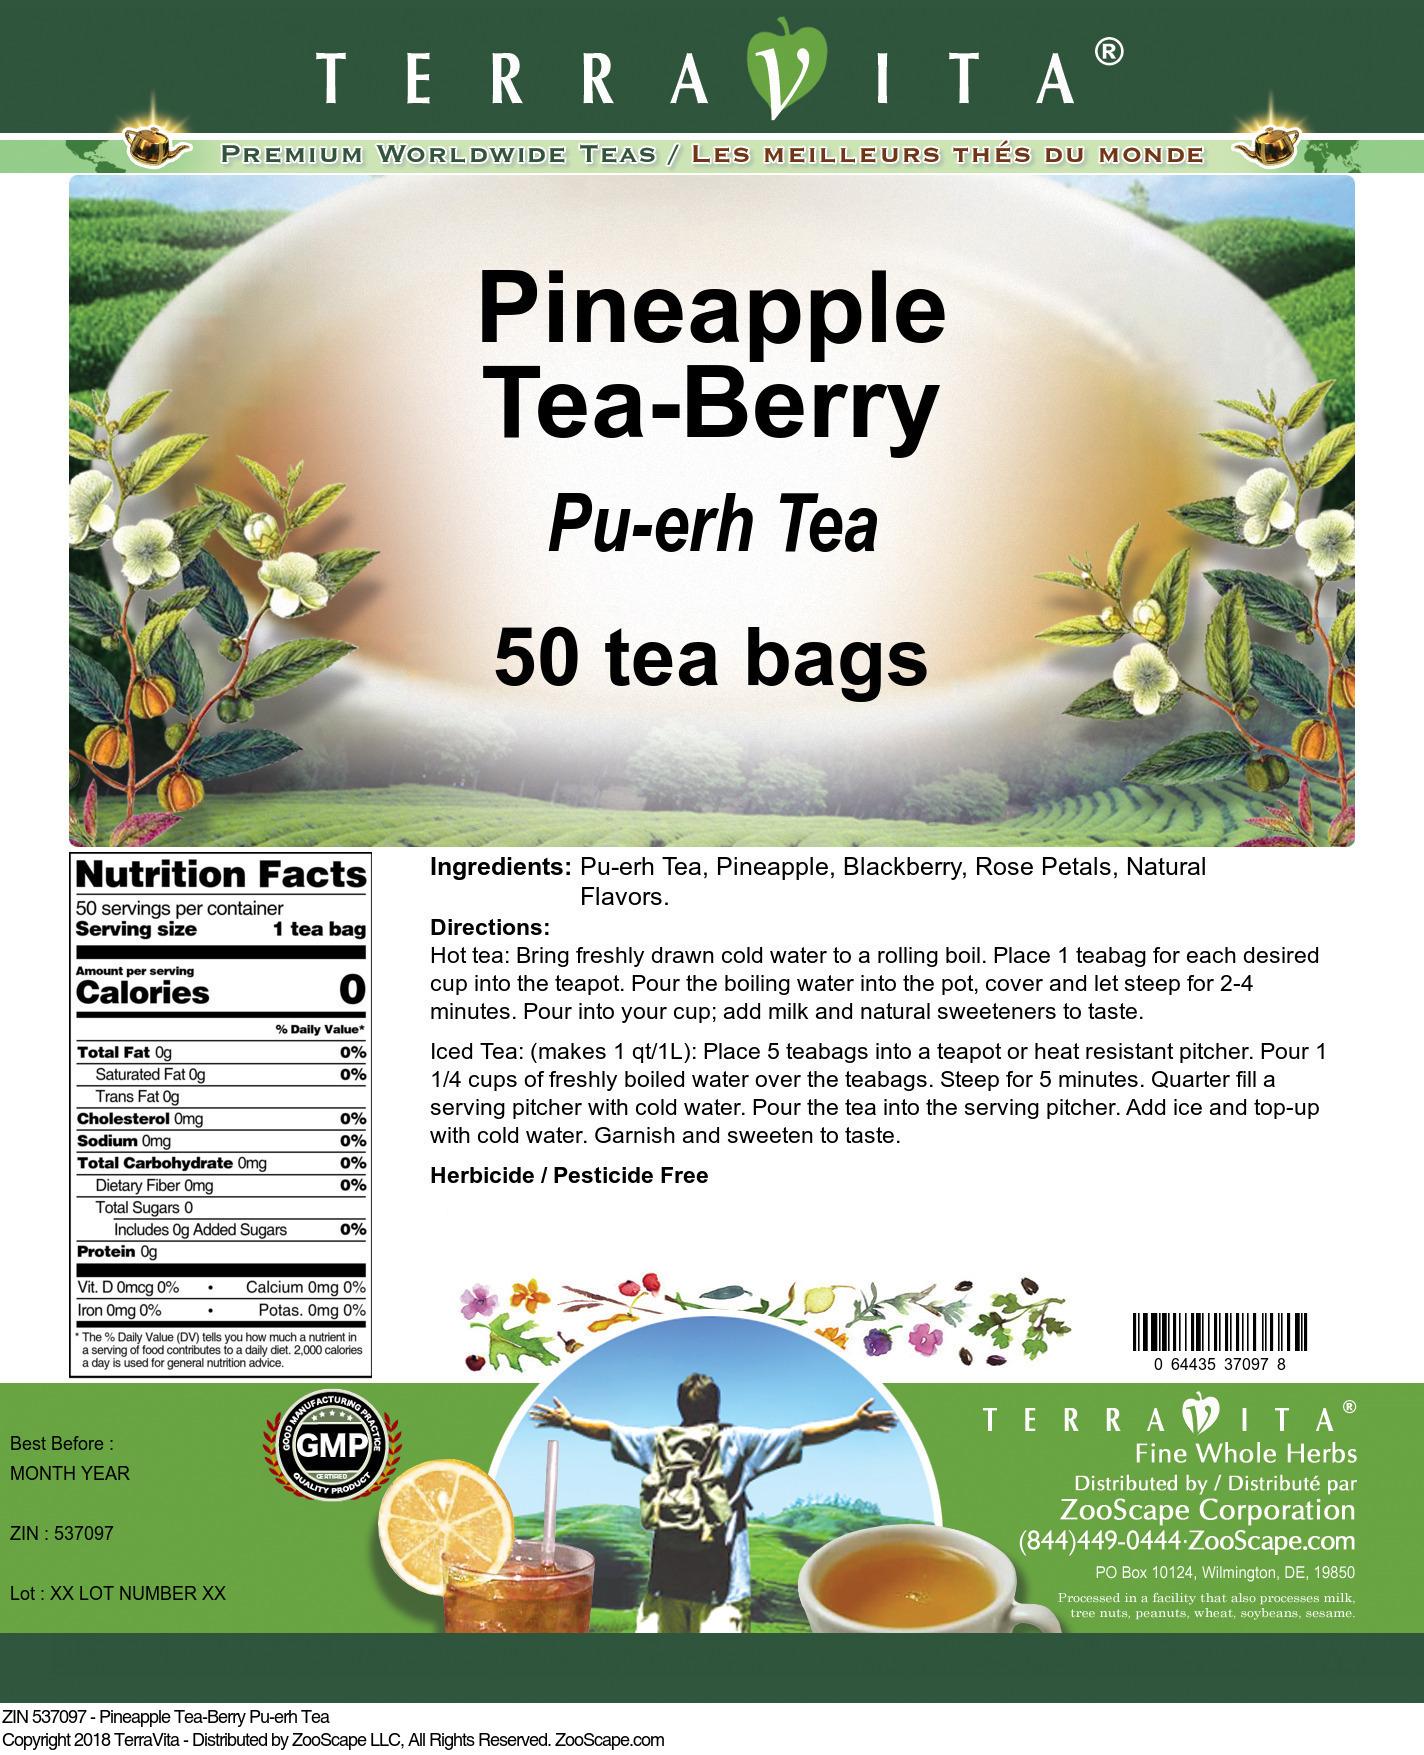 Pineapple Tea-Berry Pu-erh Tea